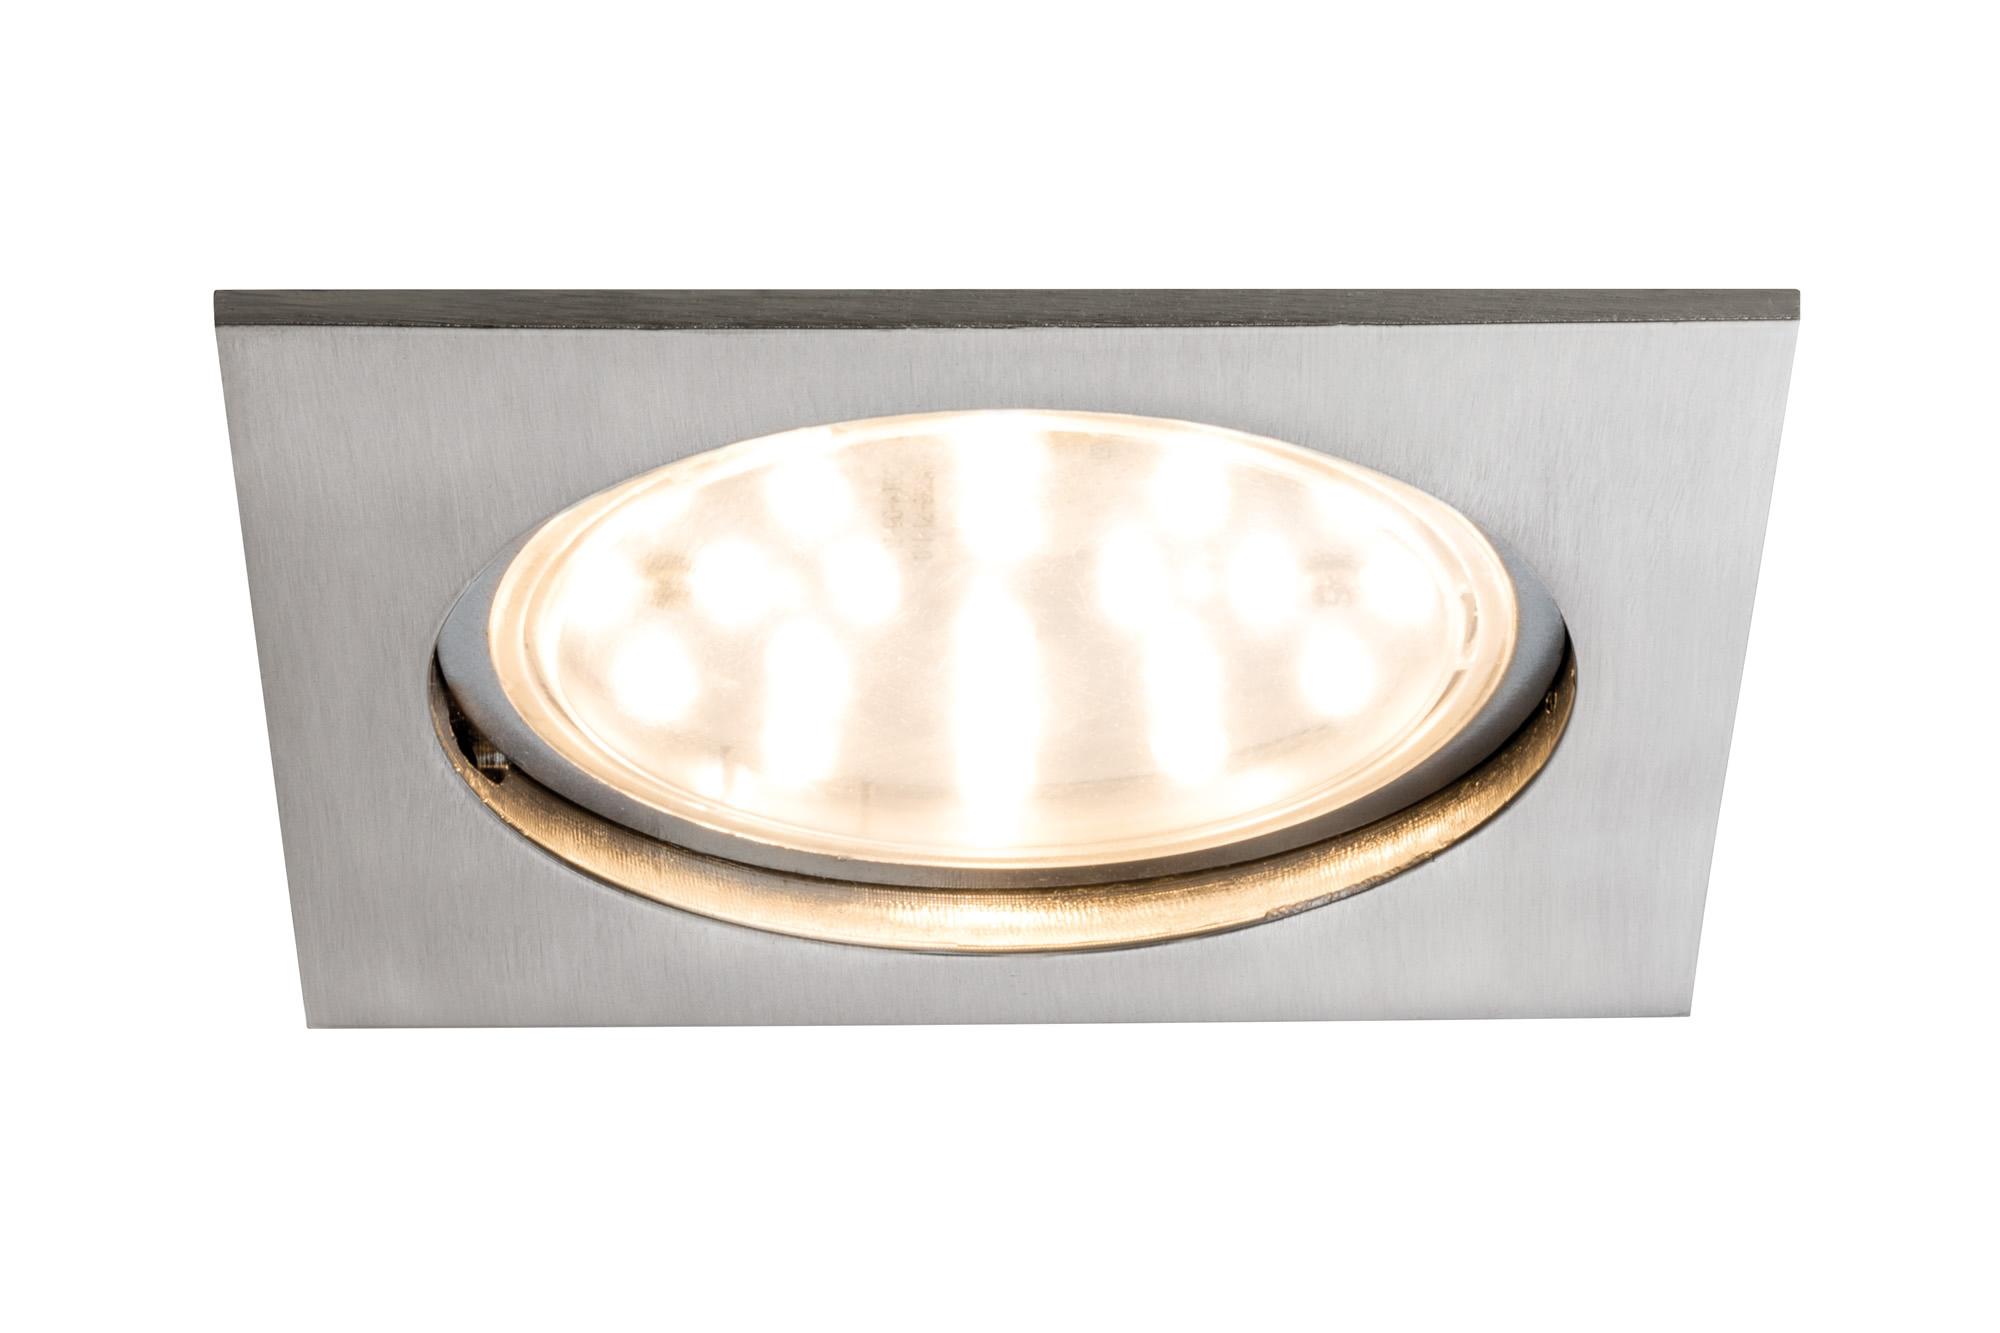 Paulmann. 92784 Светильник EBL Set Coin LED 1x12W eckig Eis-g 75mm